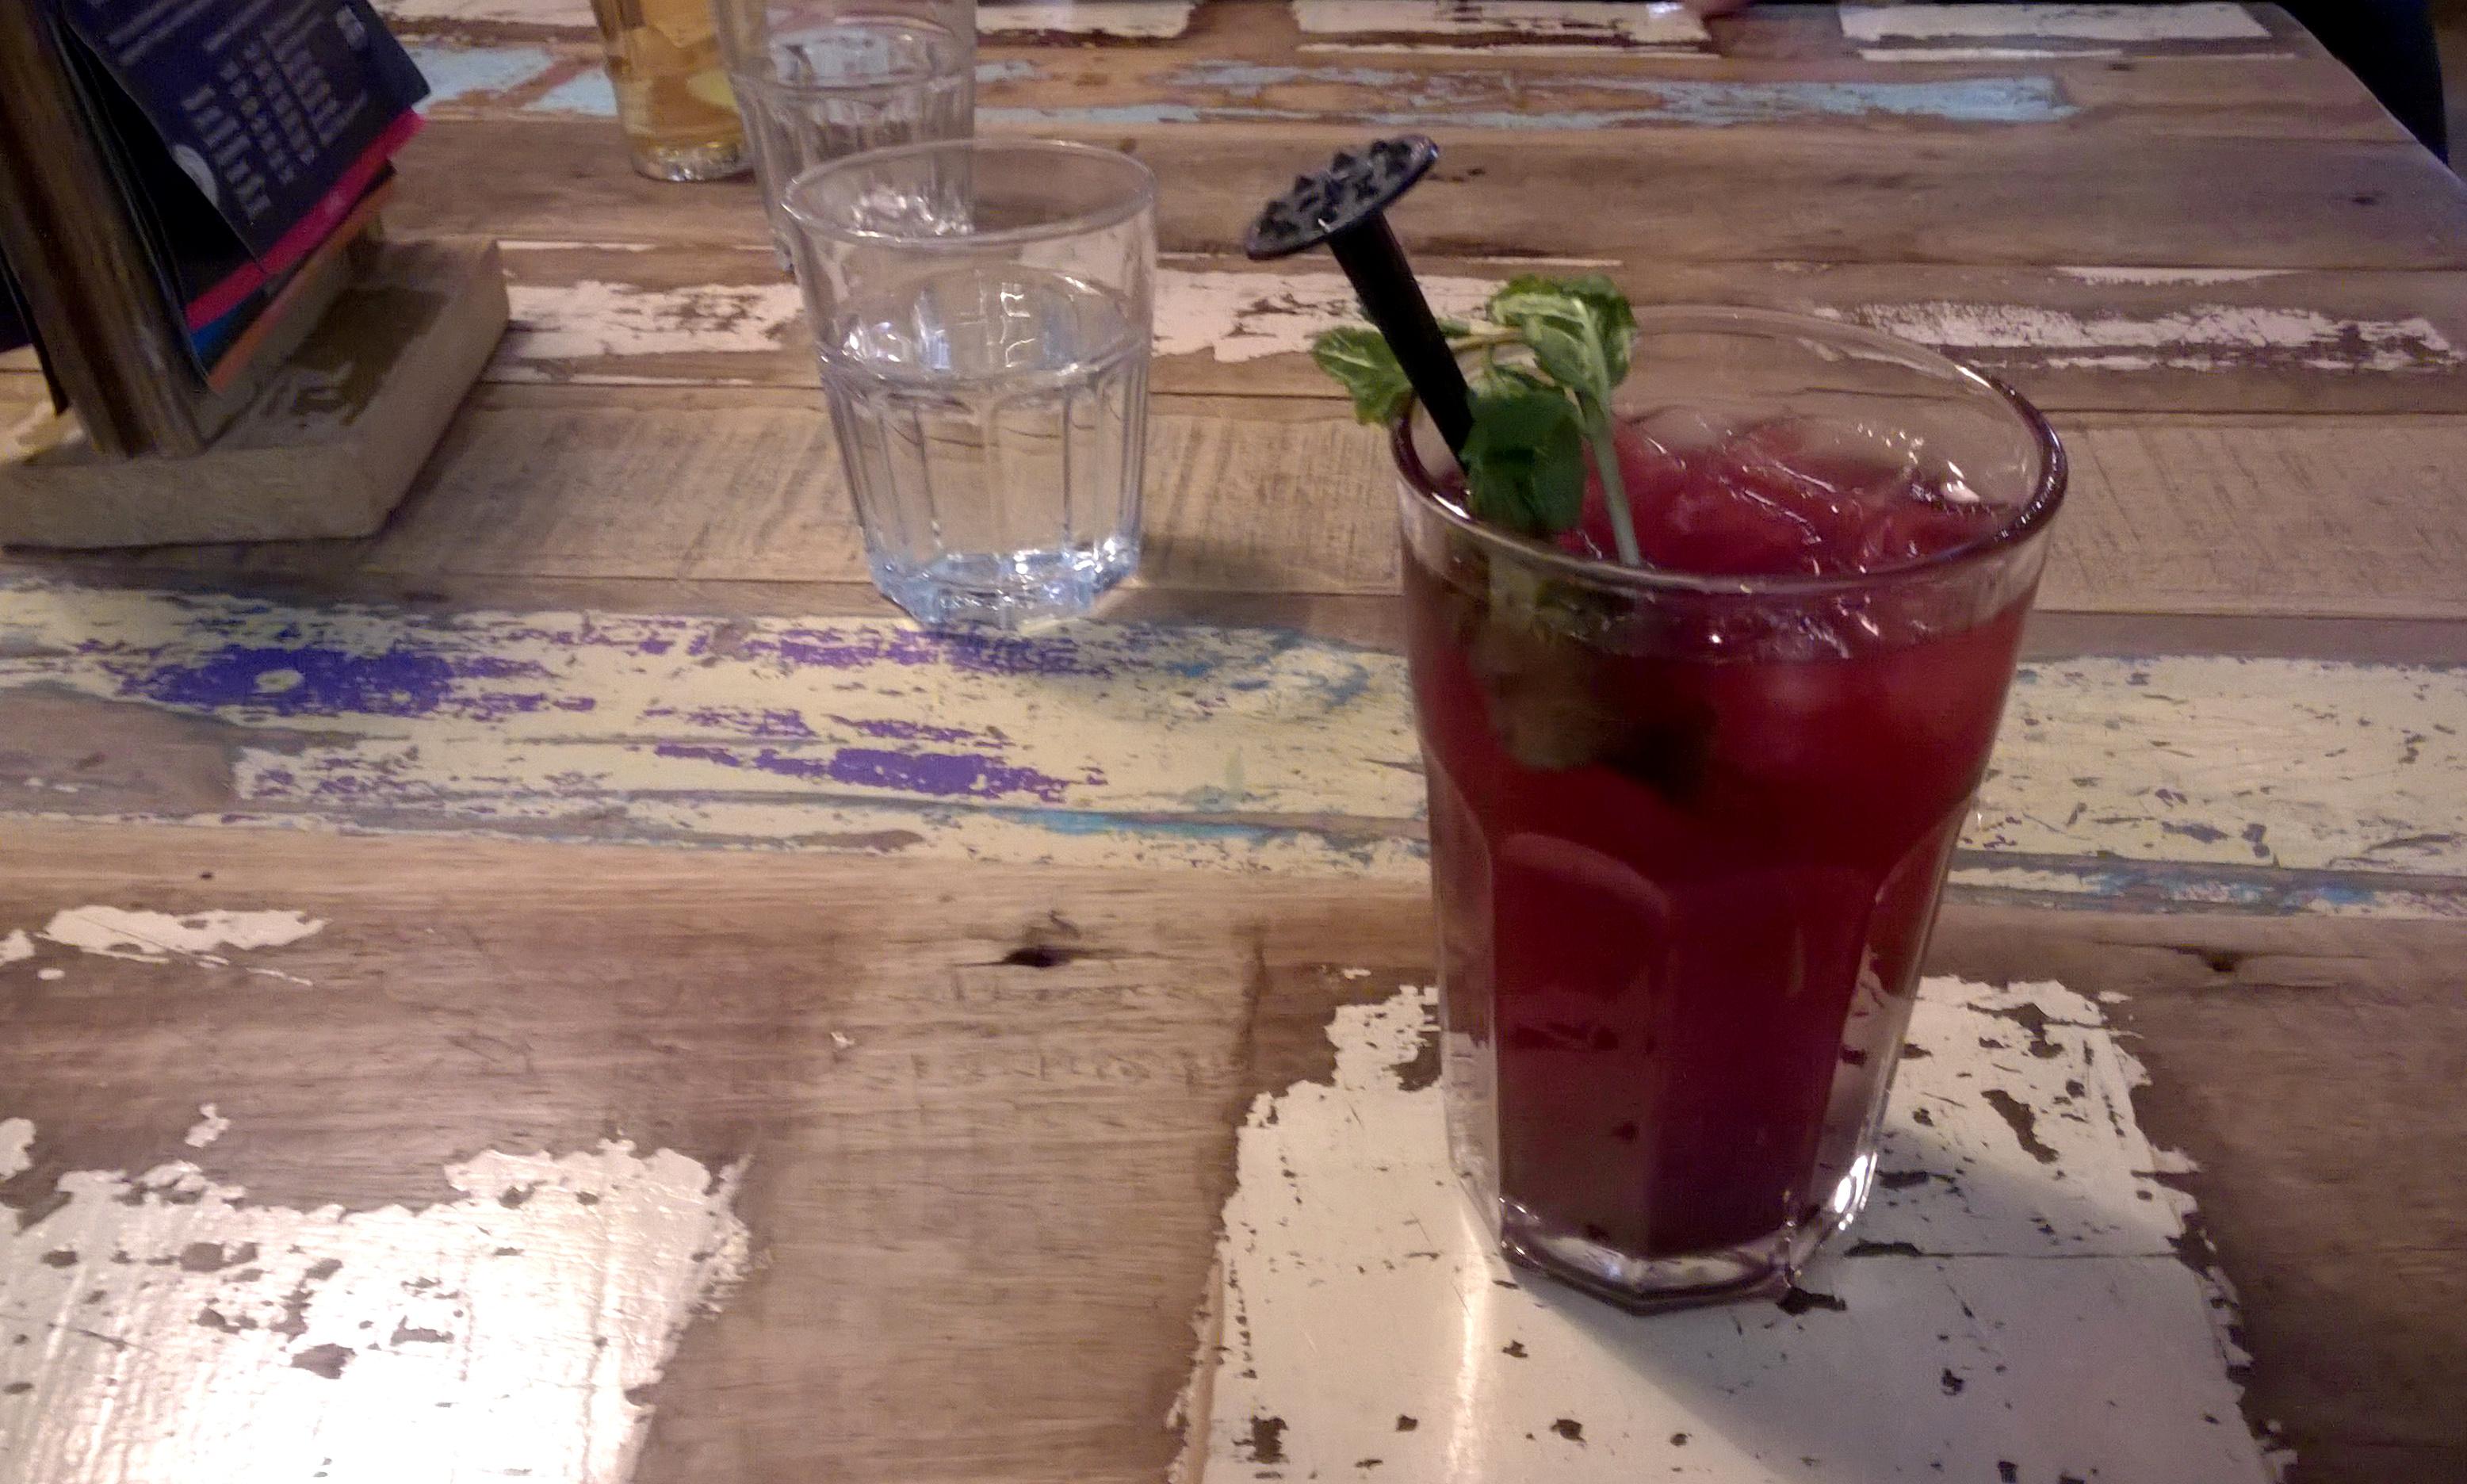 Drinks at Wadapartja